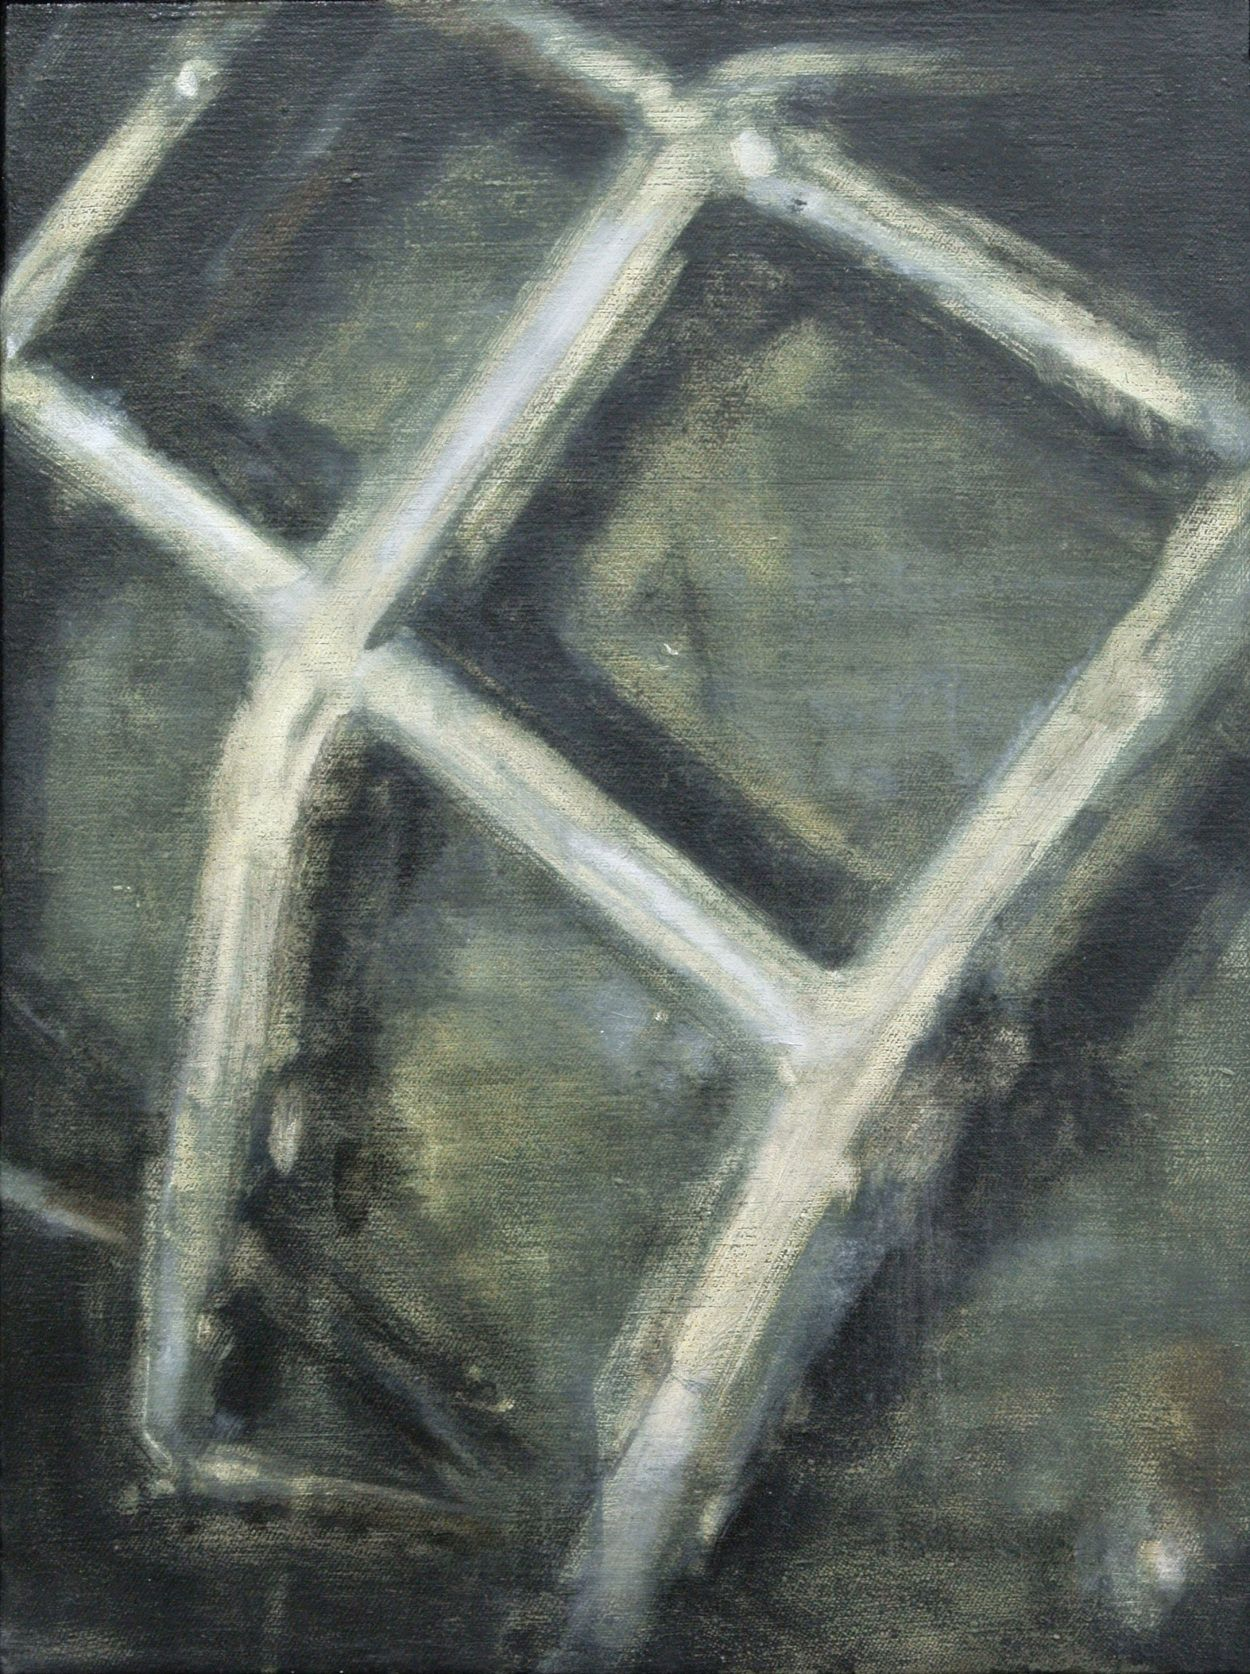 timothee-schelstraete-conferre-2014-huile-sur-toile-40x30cm-24934319e49129be0ce0301fac63ebe7